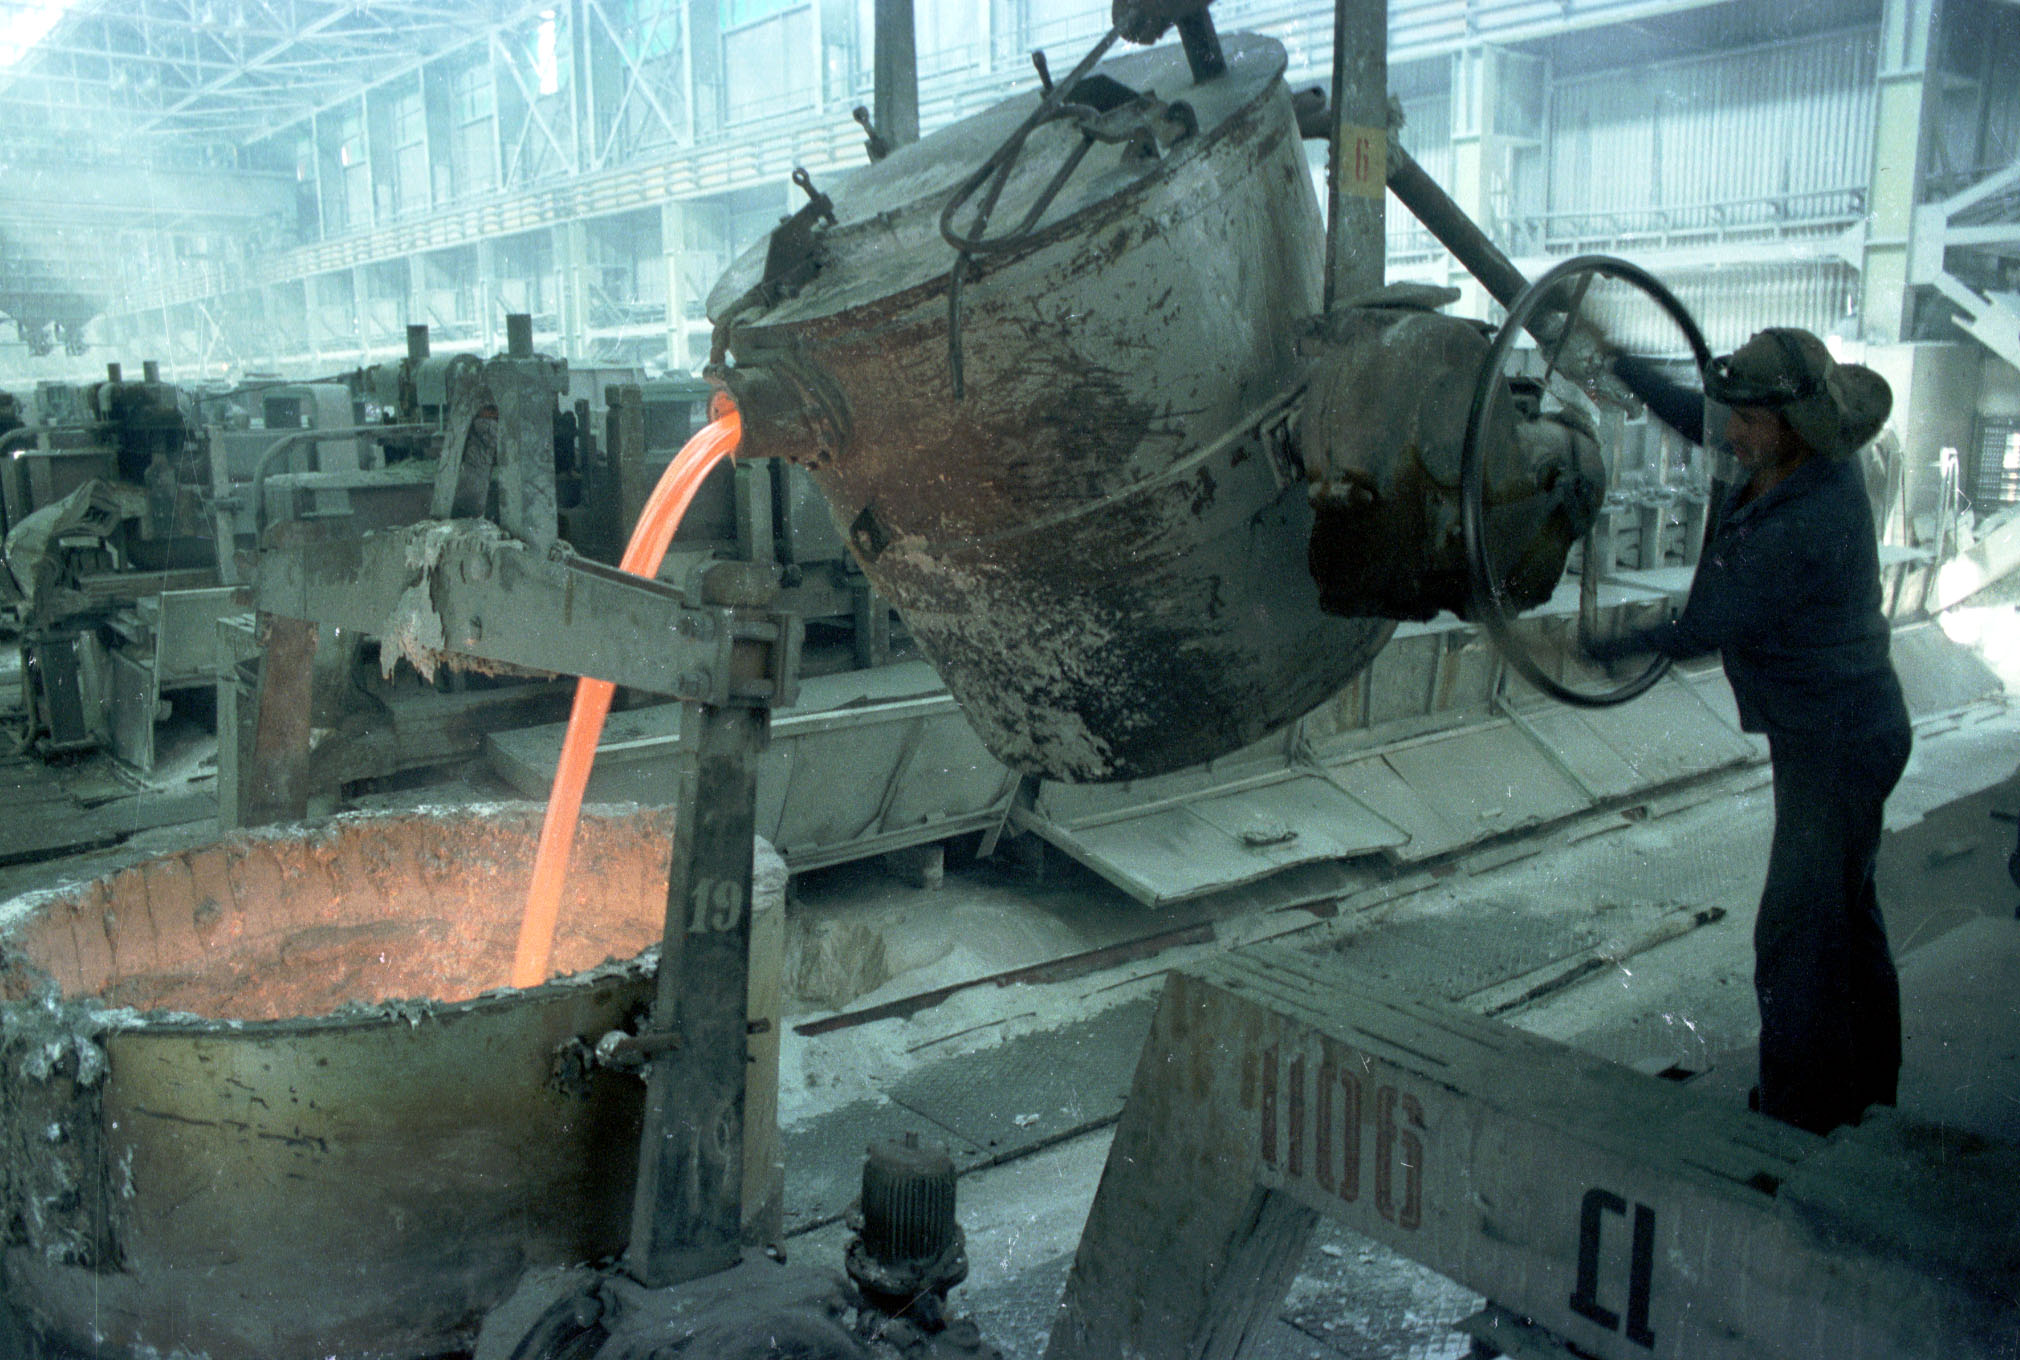 производство алюминия